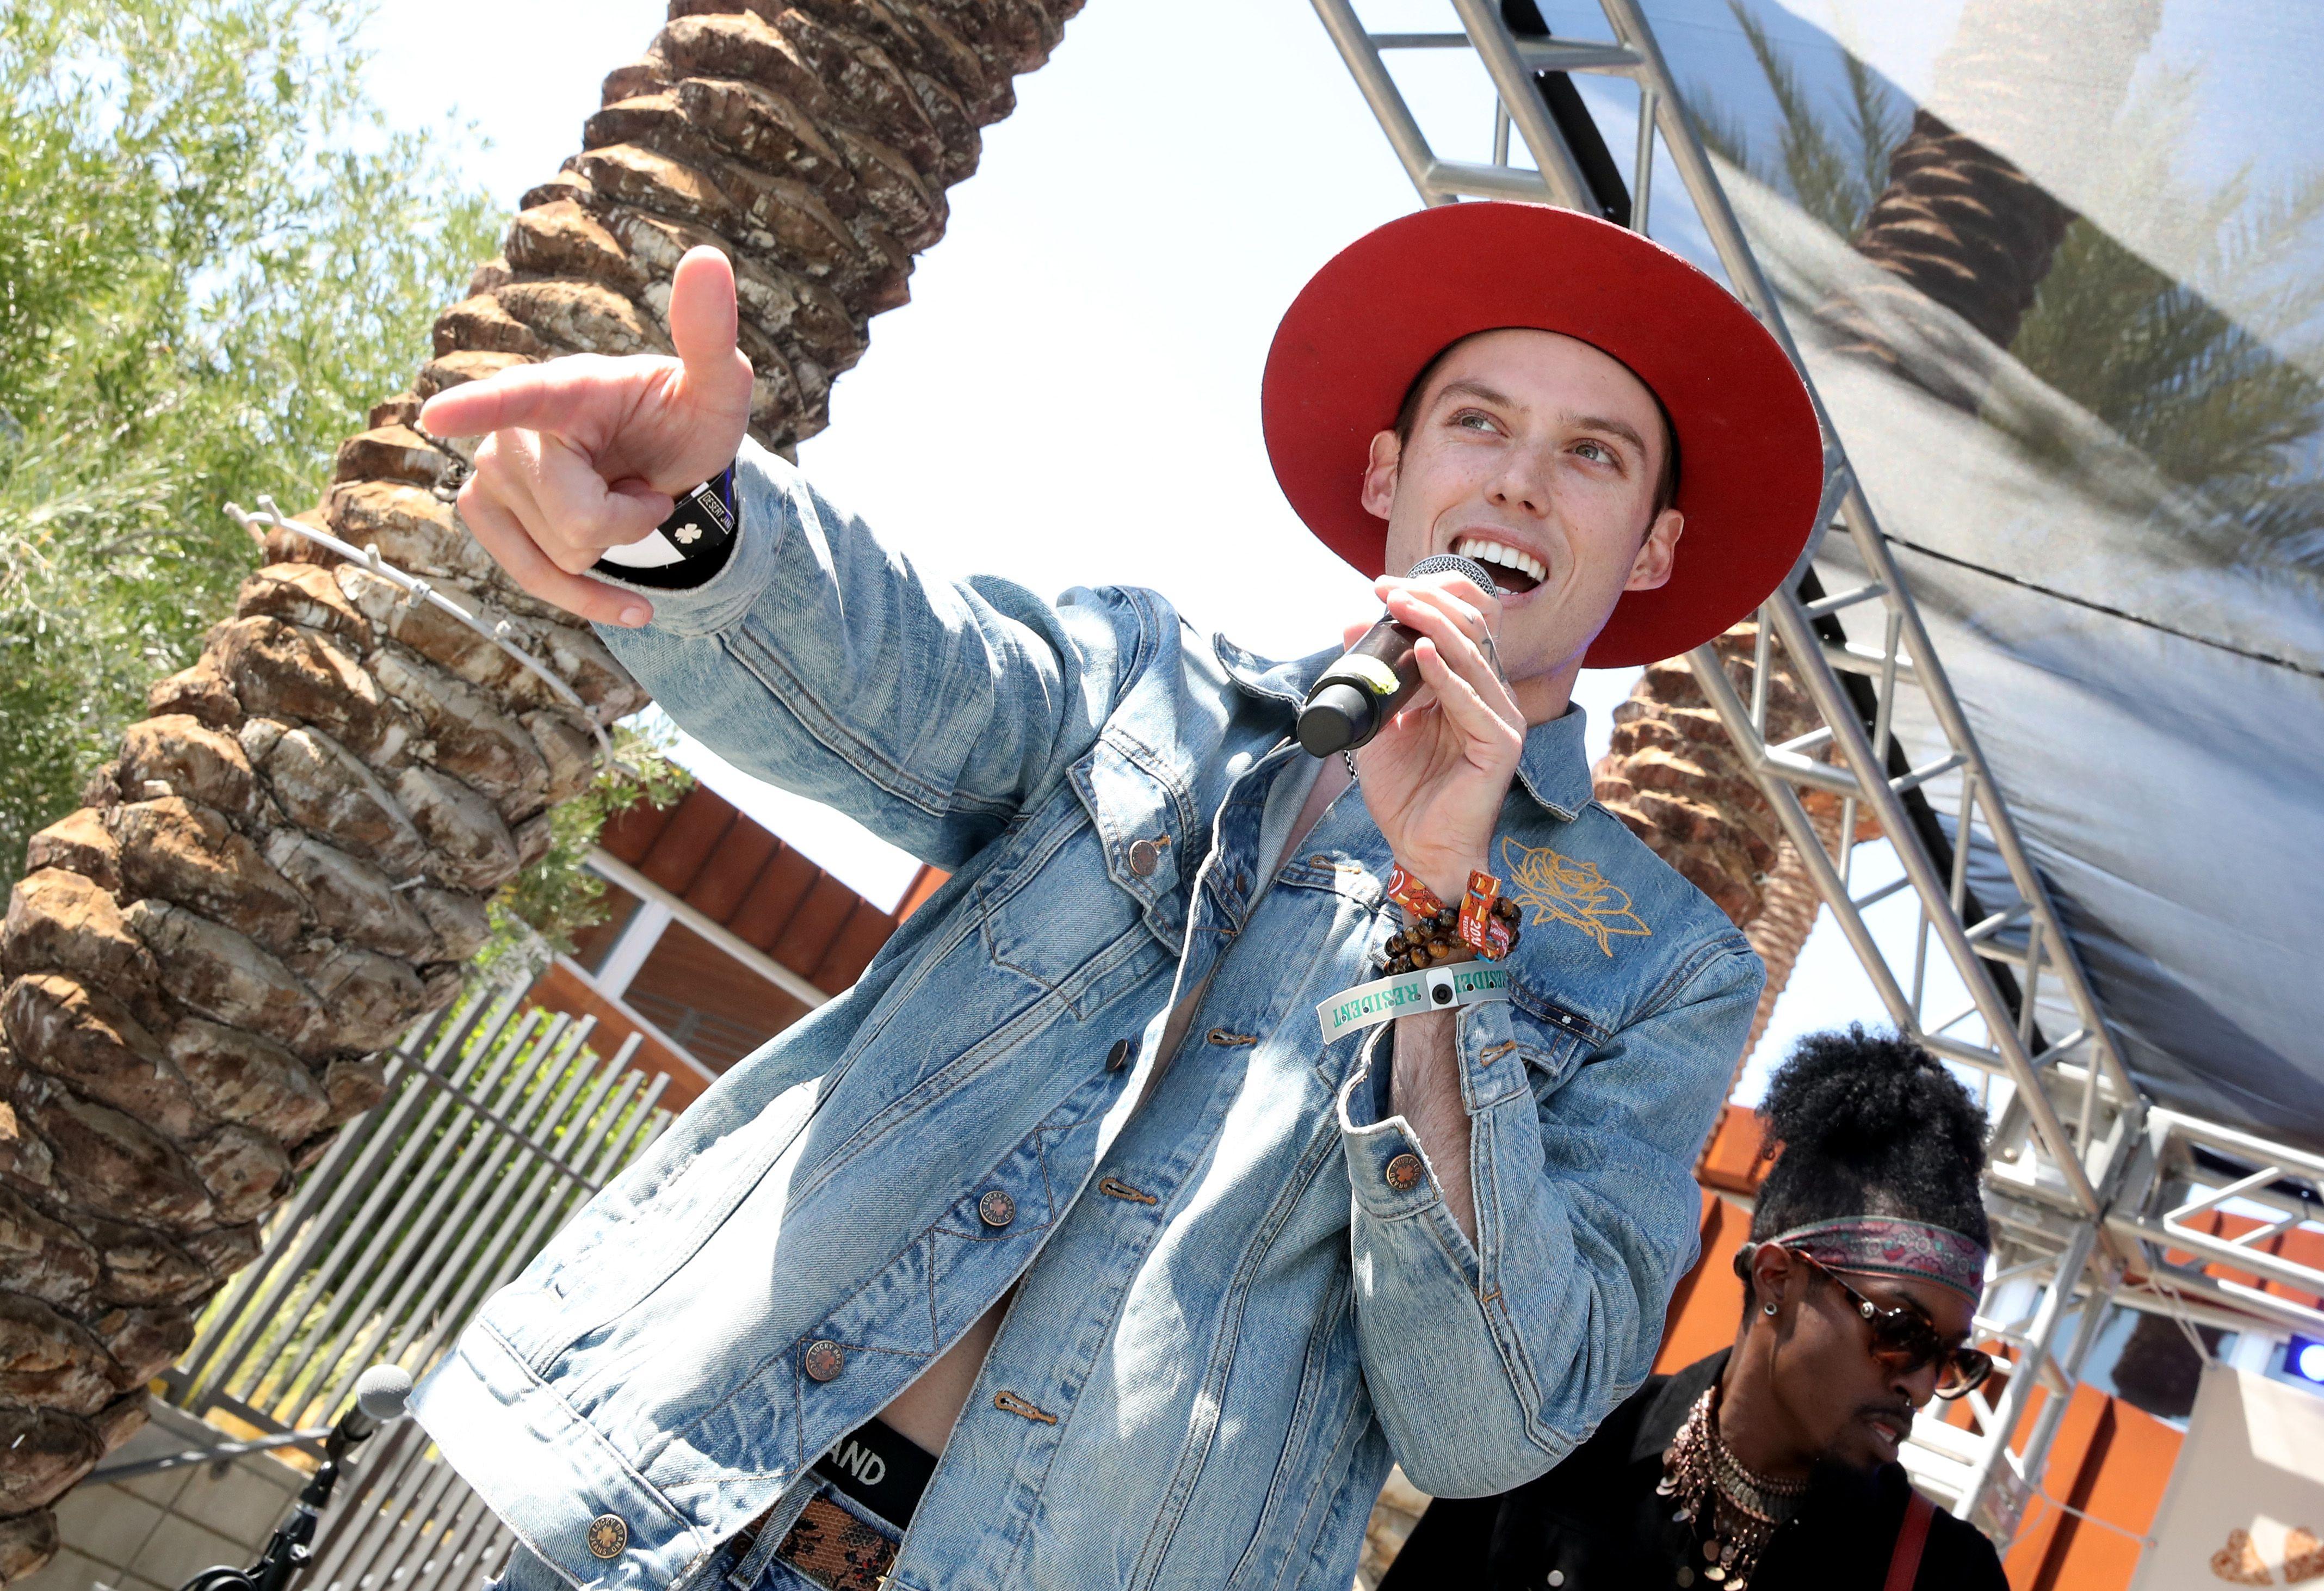 Harry HudsonLucky Desert Jam, Coachella Valley Music and Arts Festival, Palm Springs, USA - 14 Apr 2018